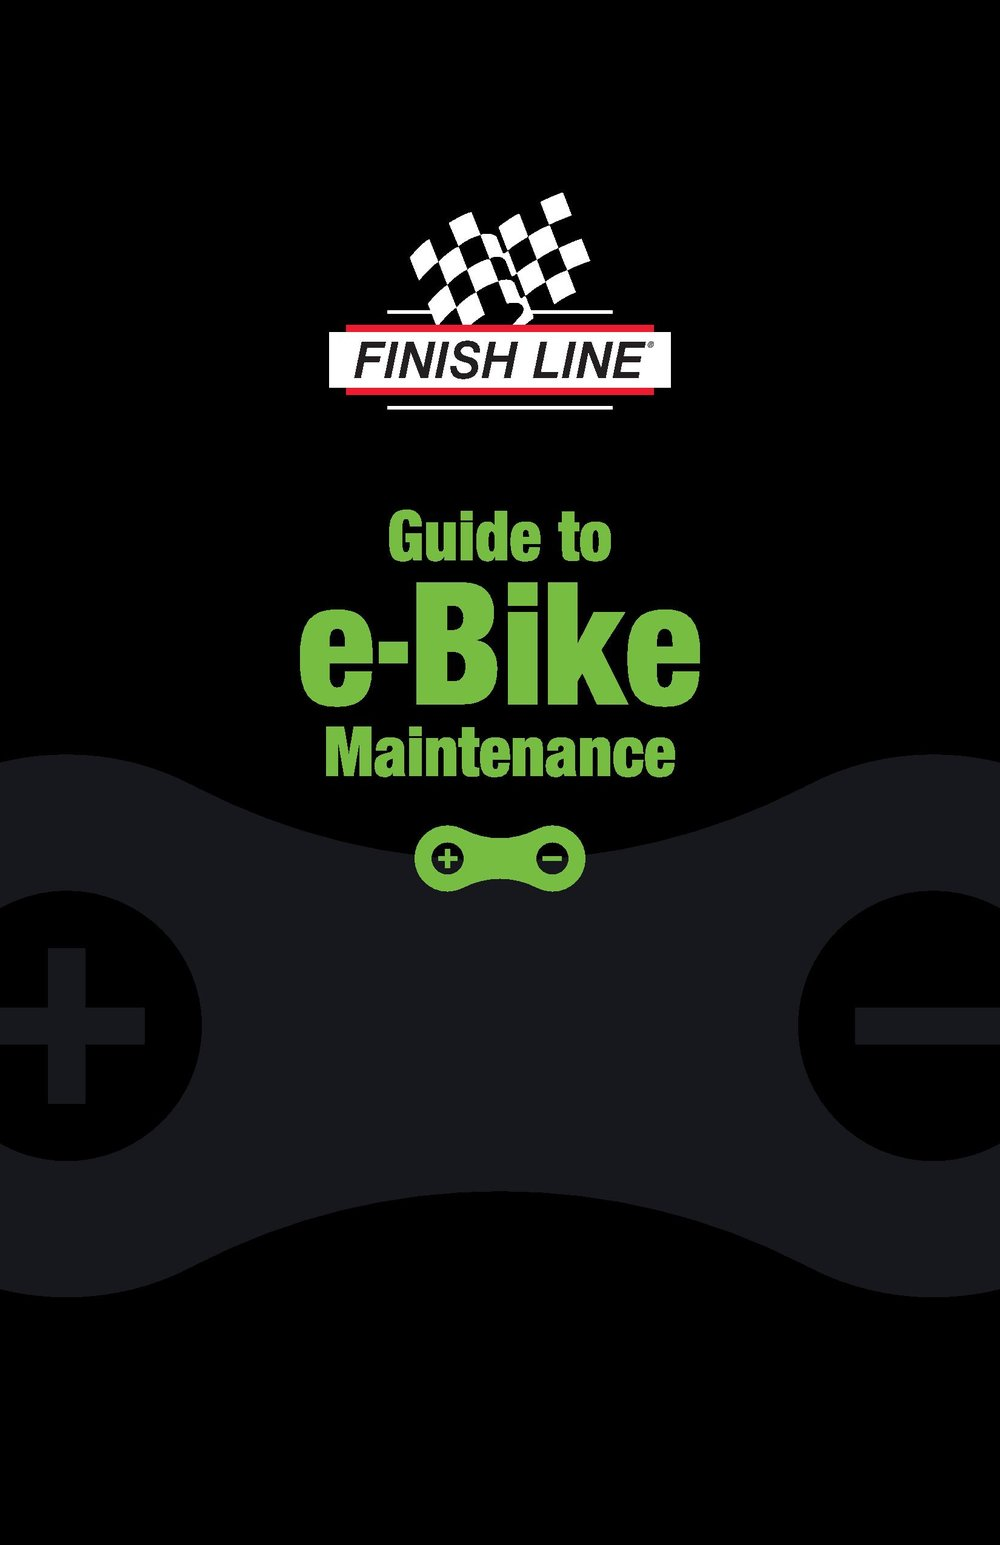 Finish Line e-Bike Brochure